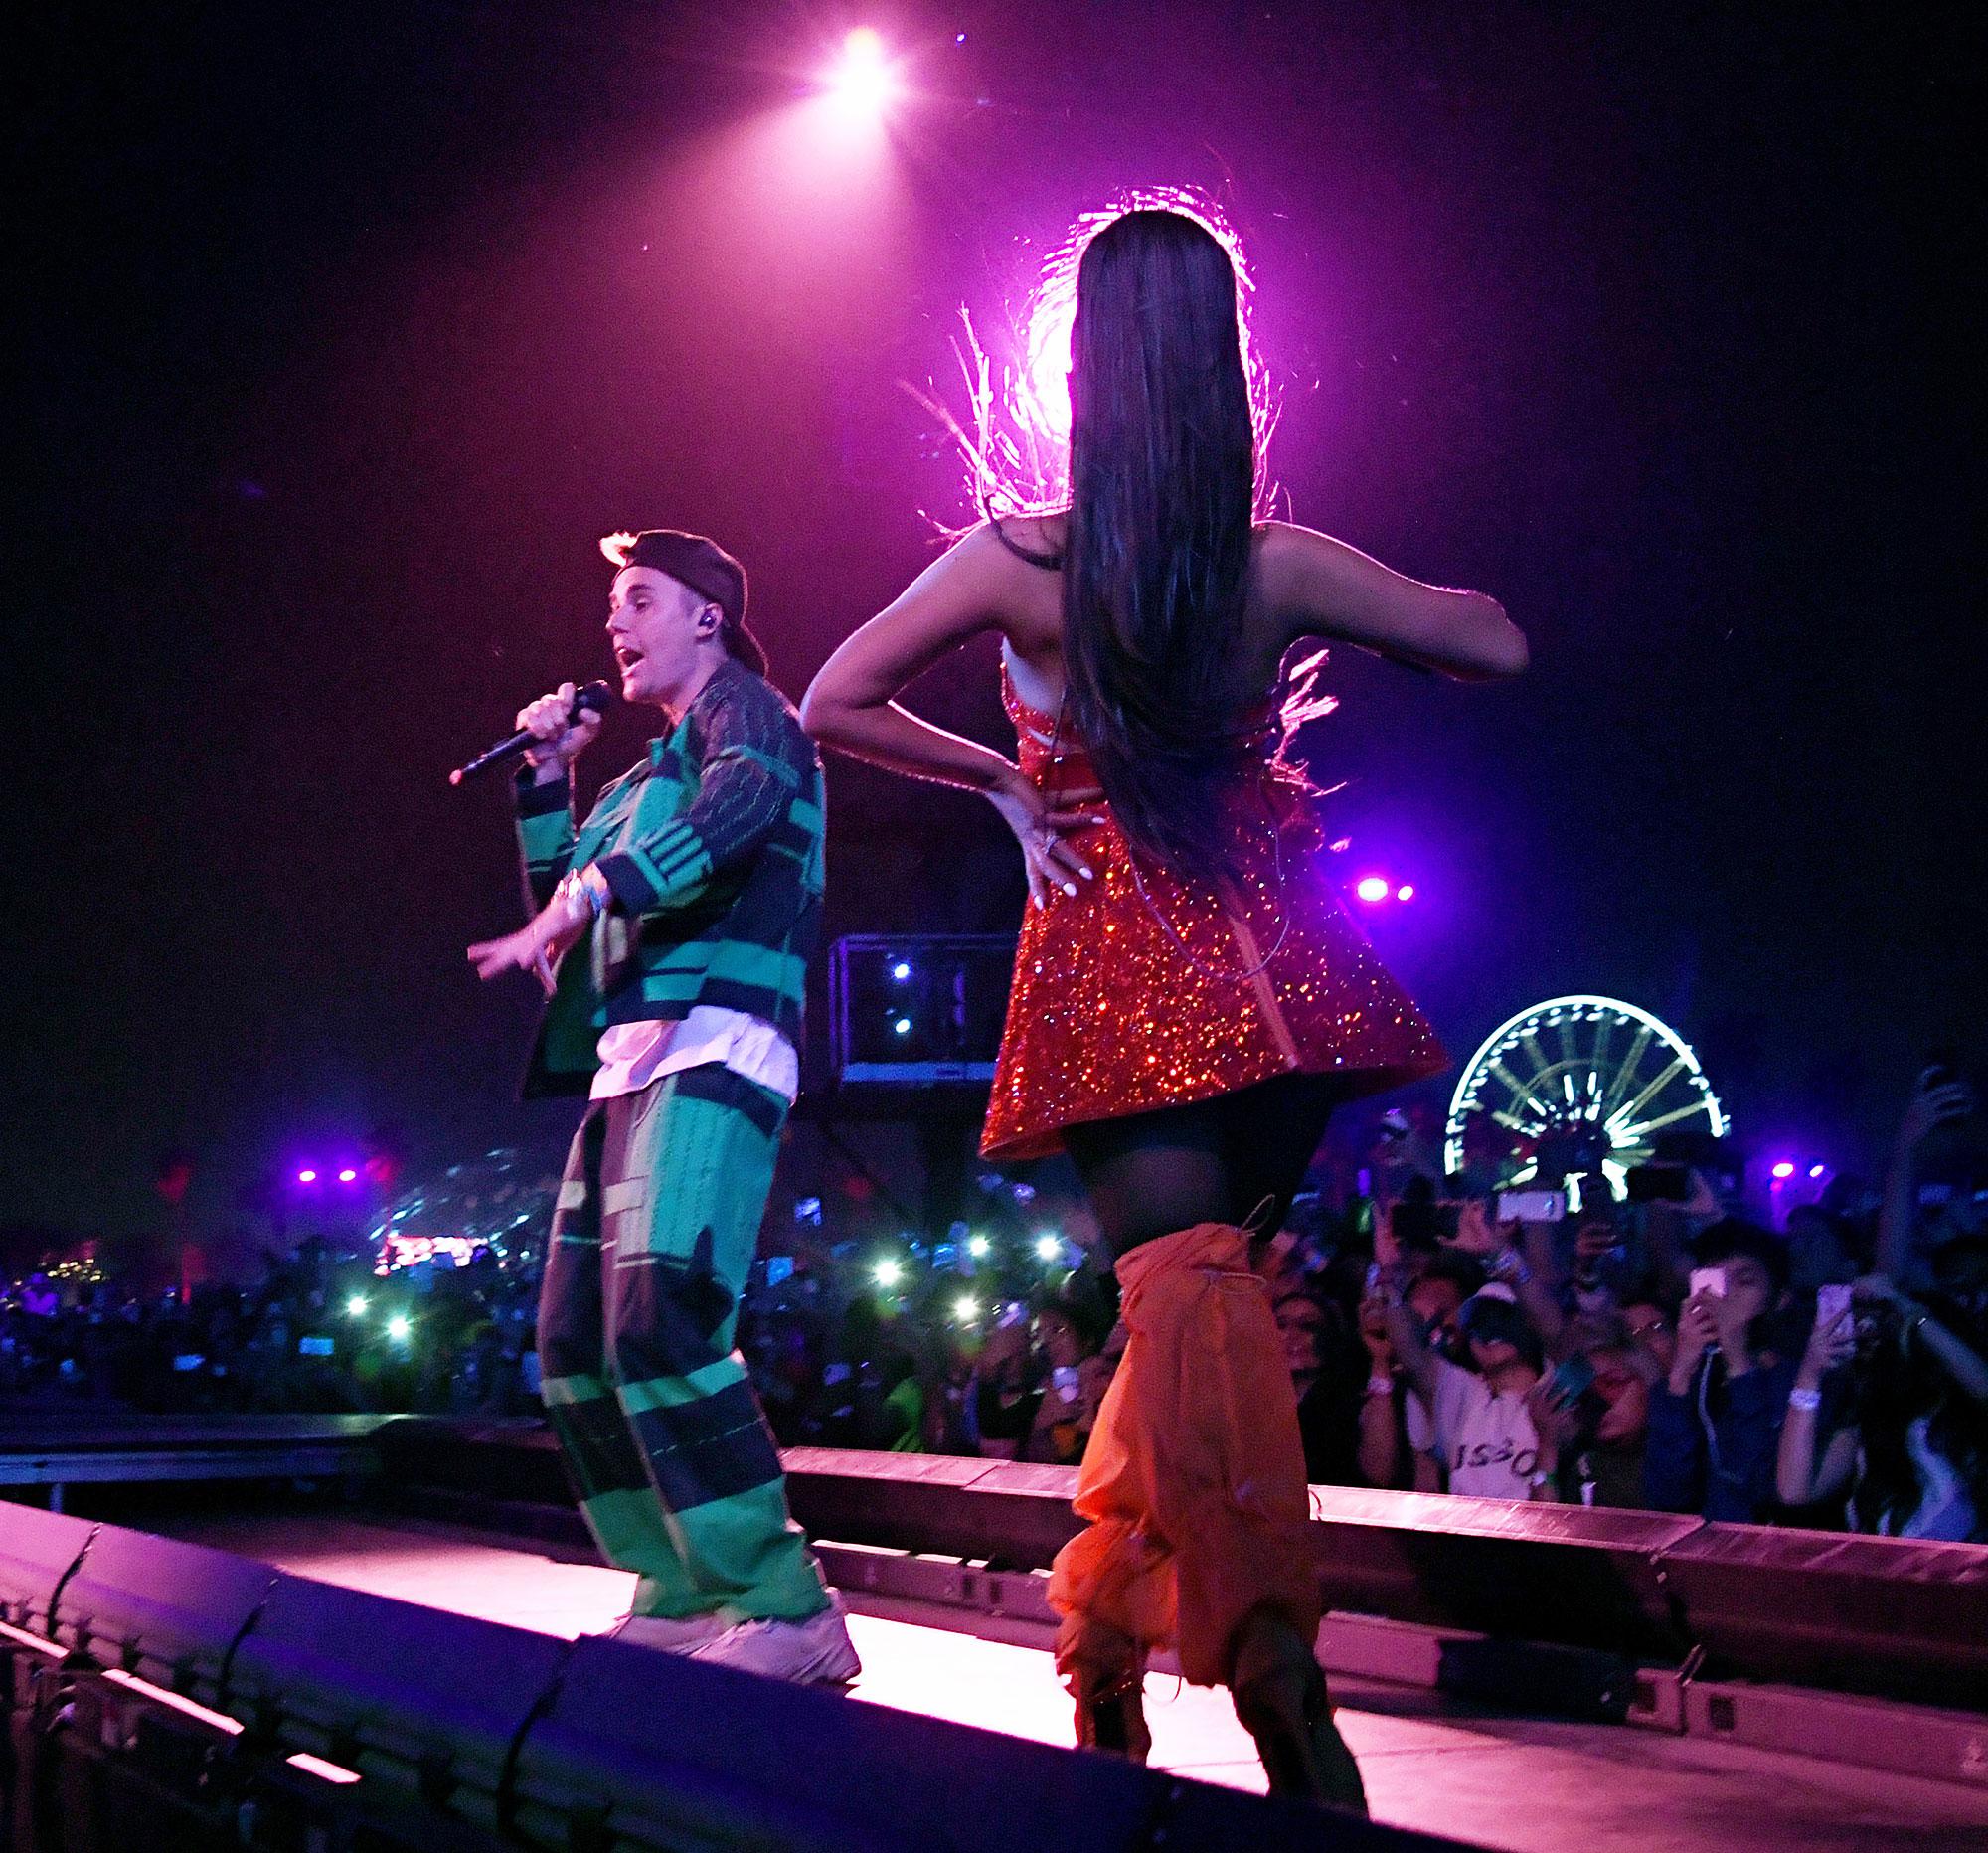 Justin Bieber Performs With Ariana Grande At Coachella 2019